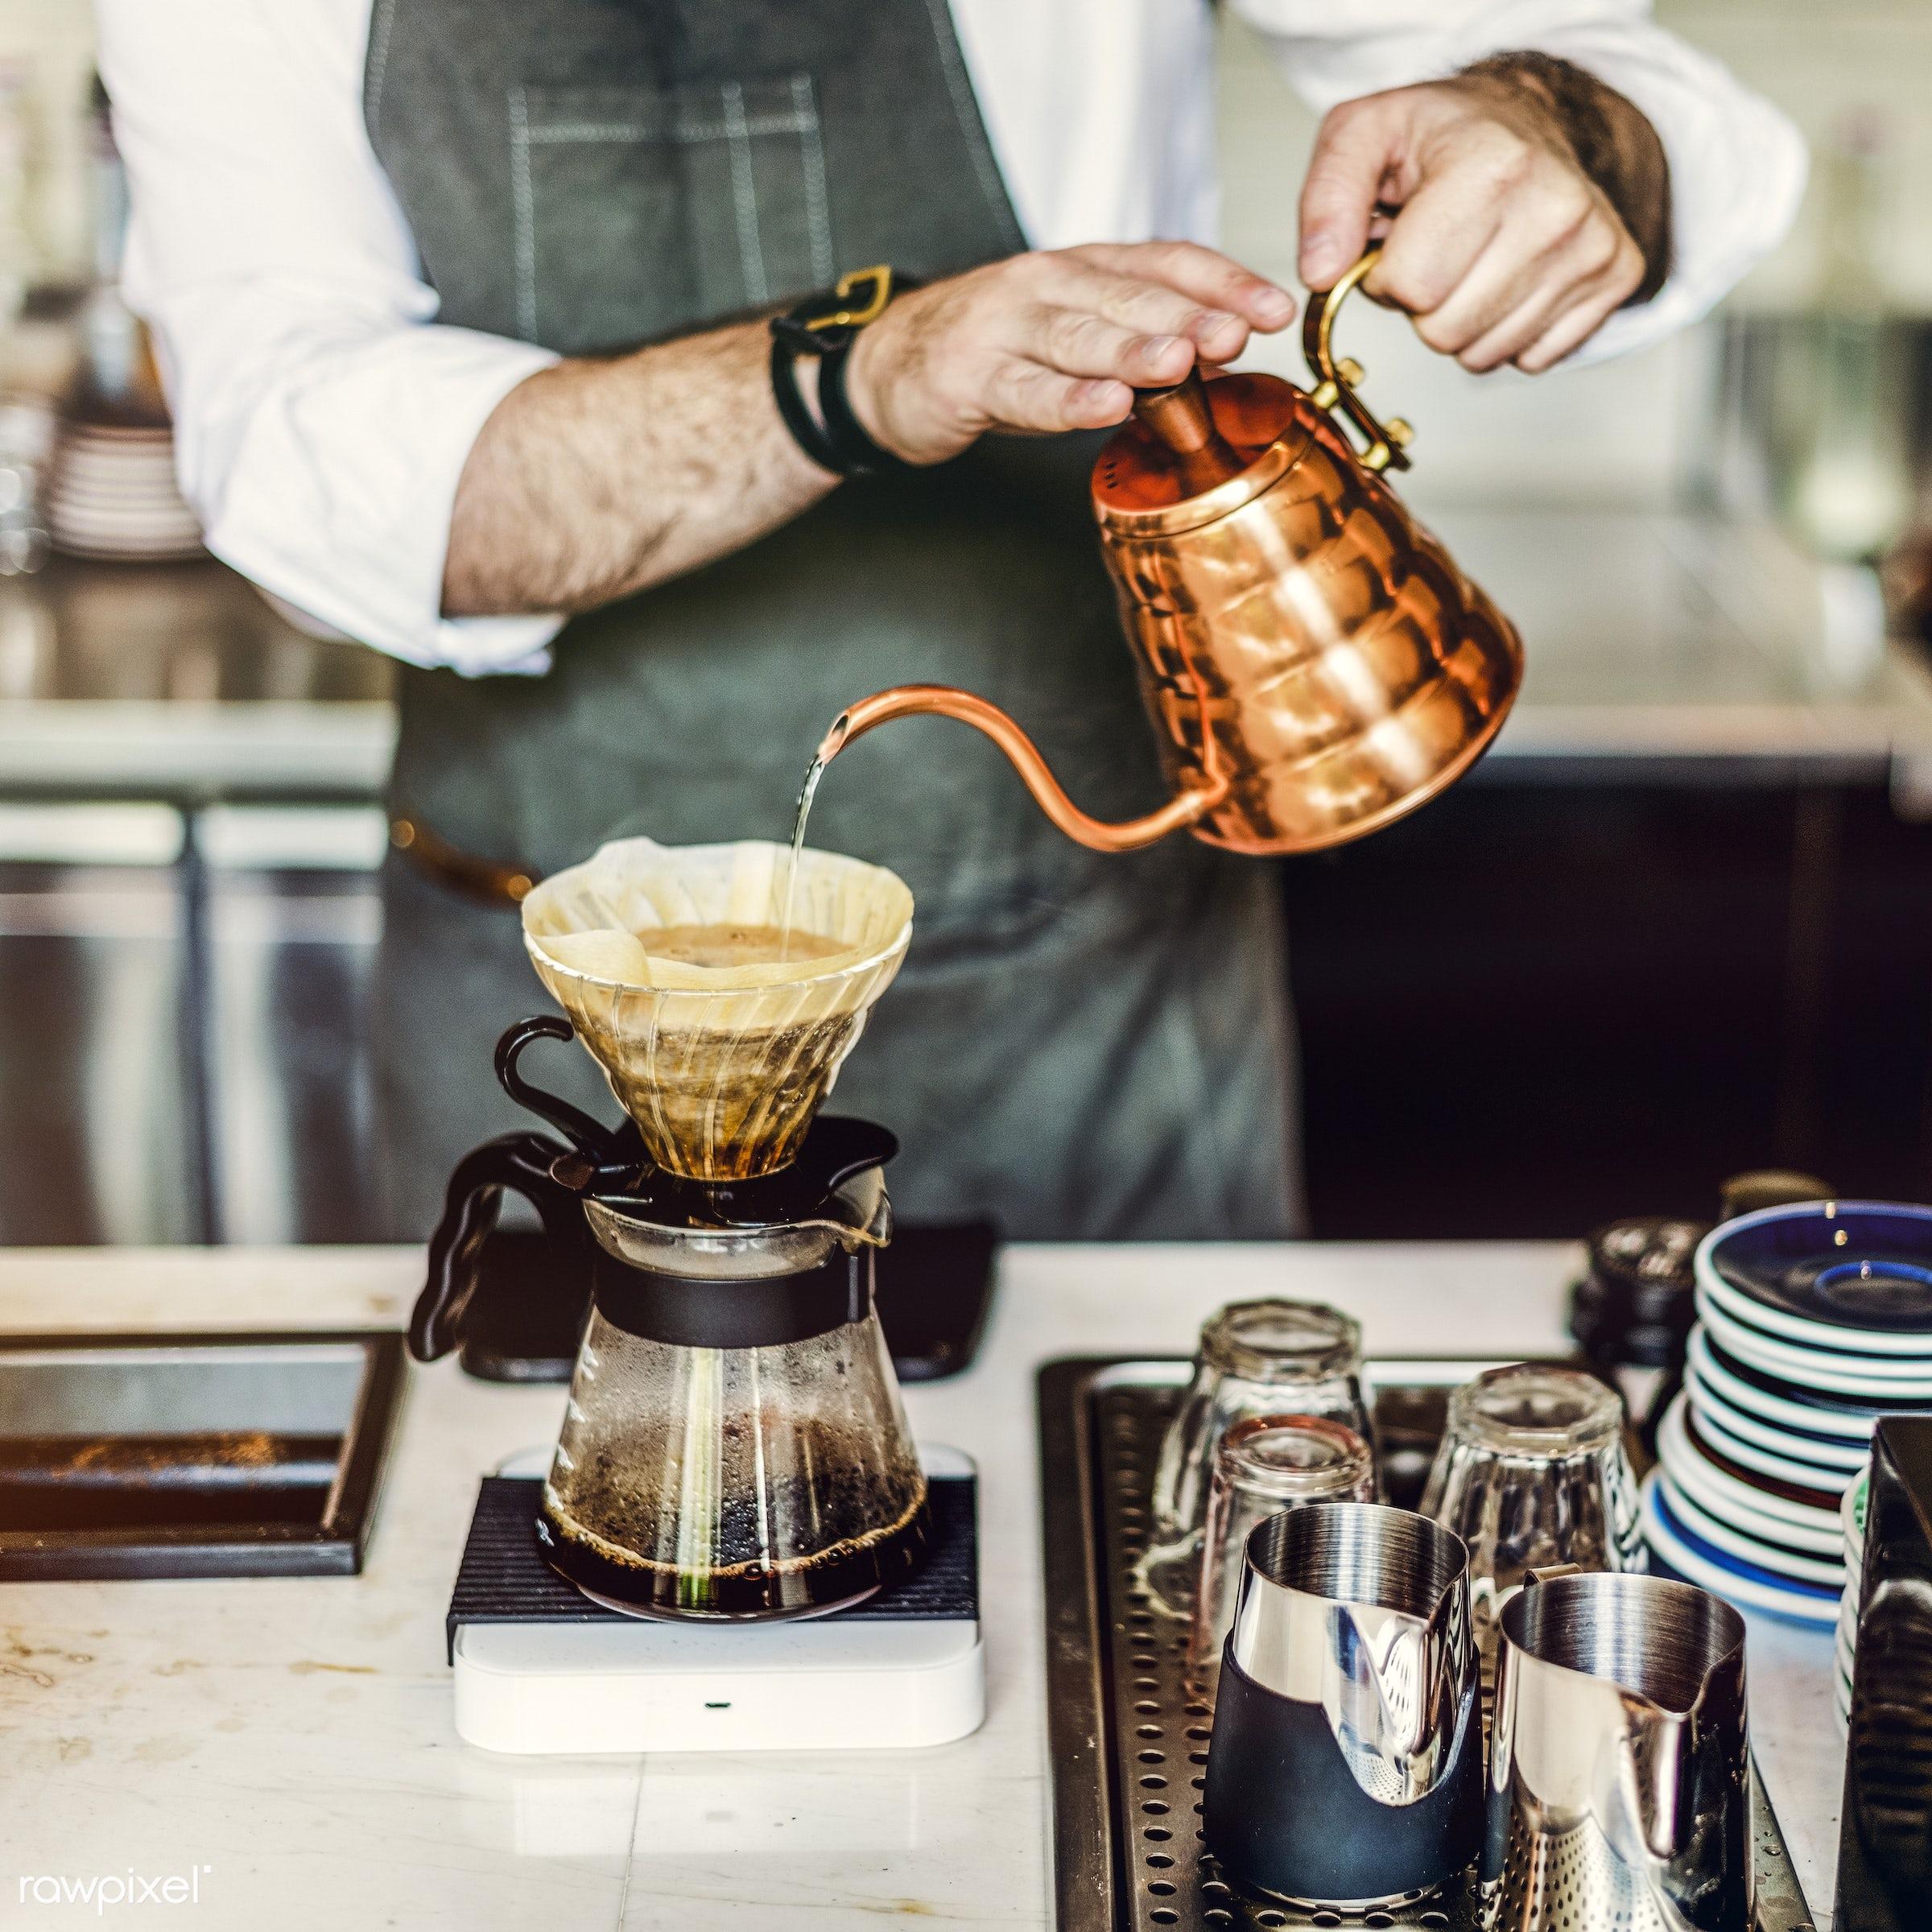 Barista is making coffee - coffee, alone, barista, beverage, brew, career, coffee shop, drink, drip, jug, machine, making,...